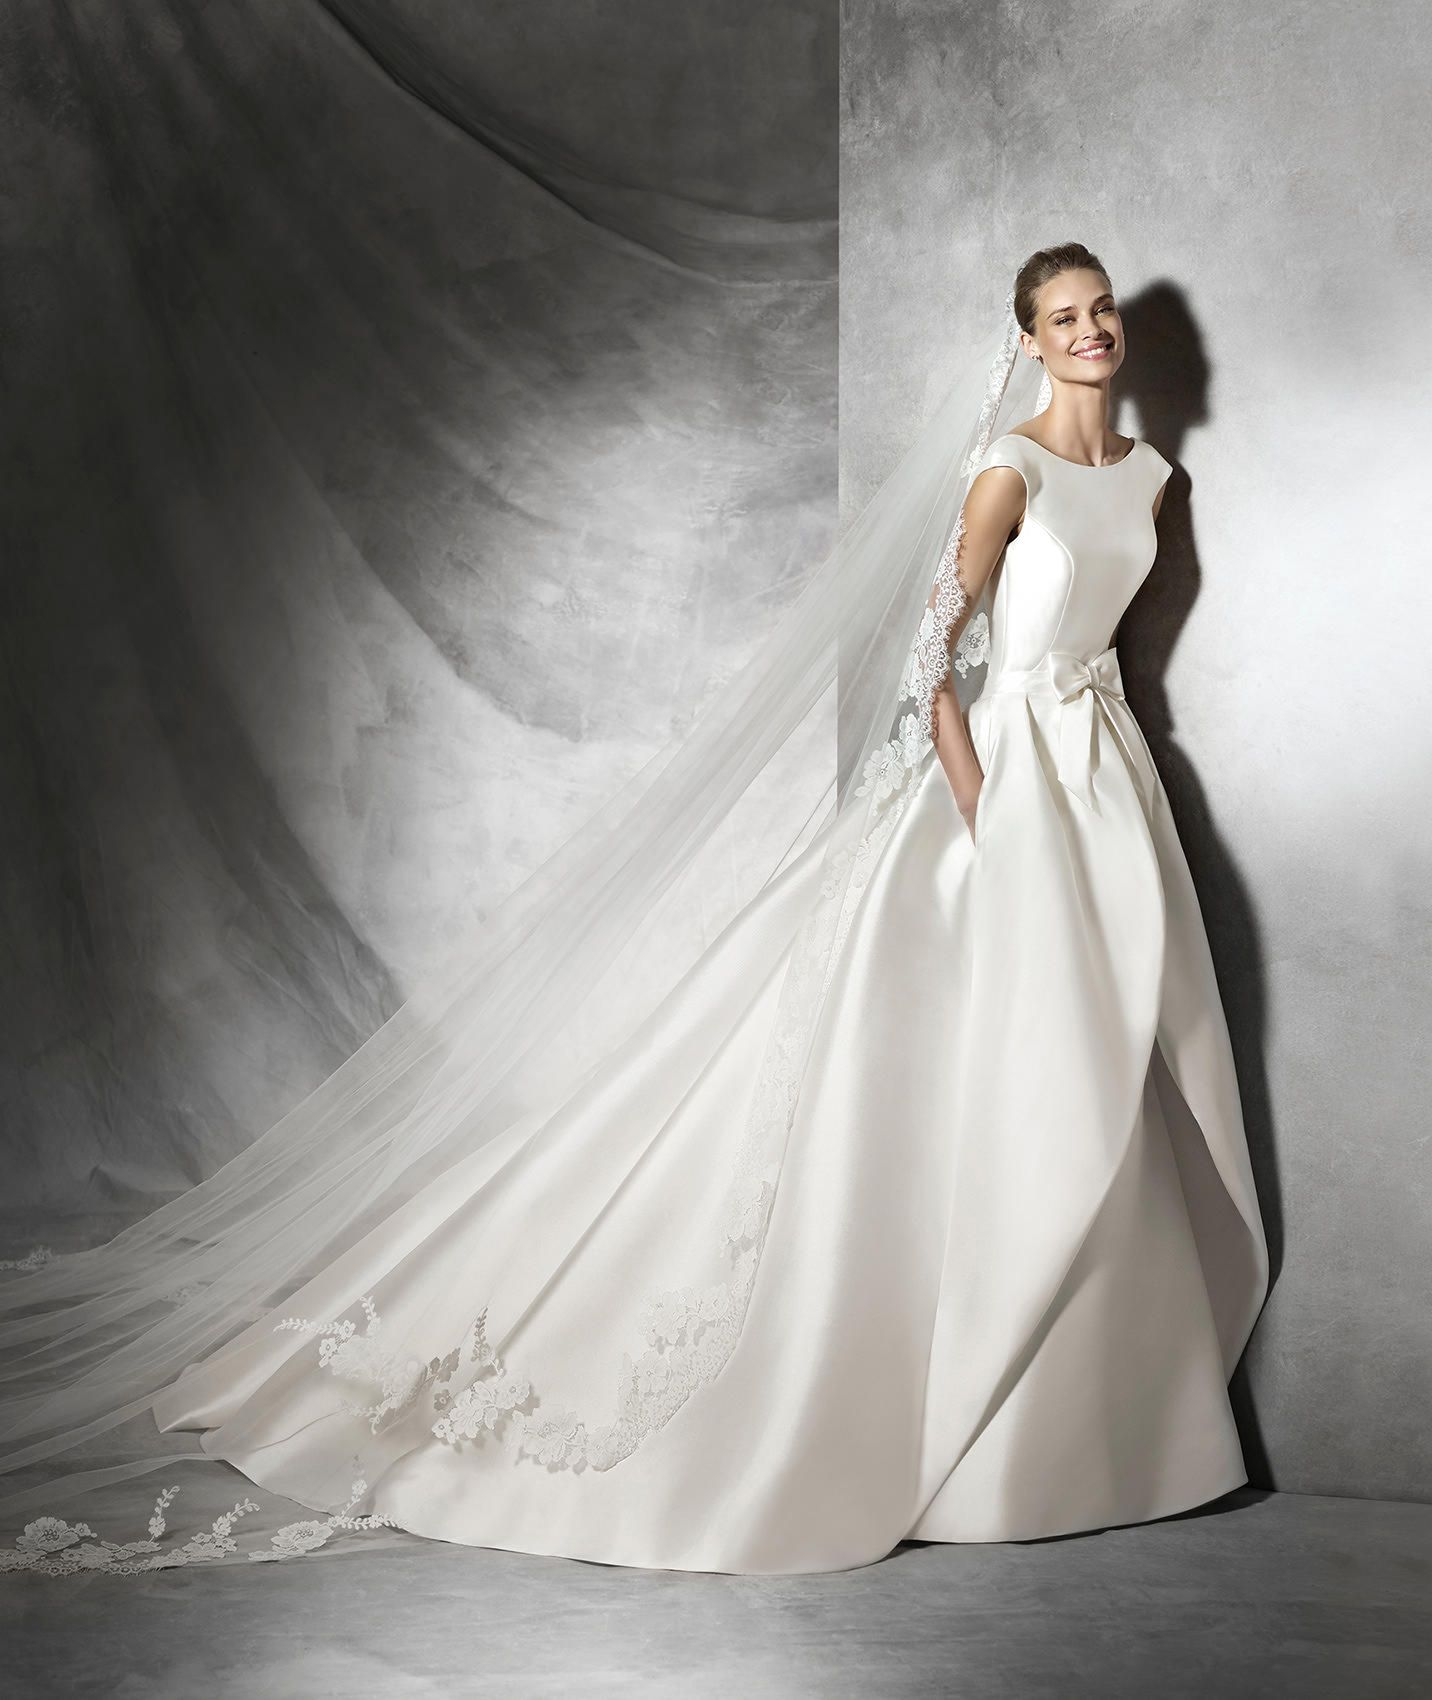 873c20e1c408 TABINA - Vestido de novia original con escote barco